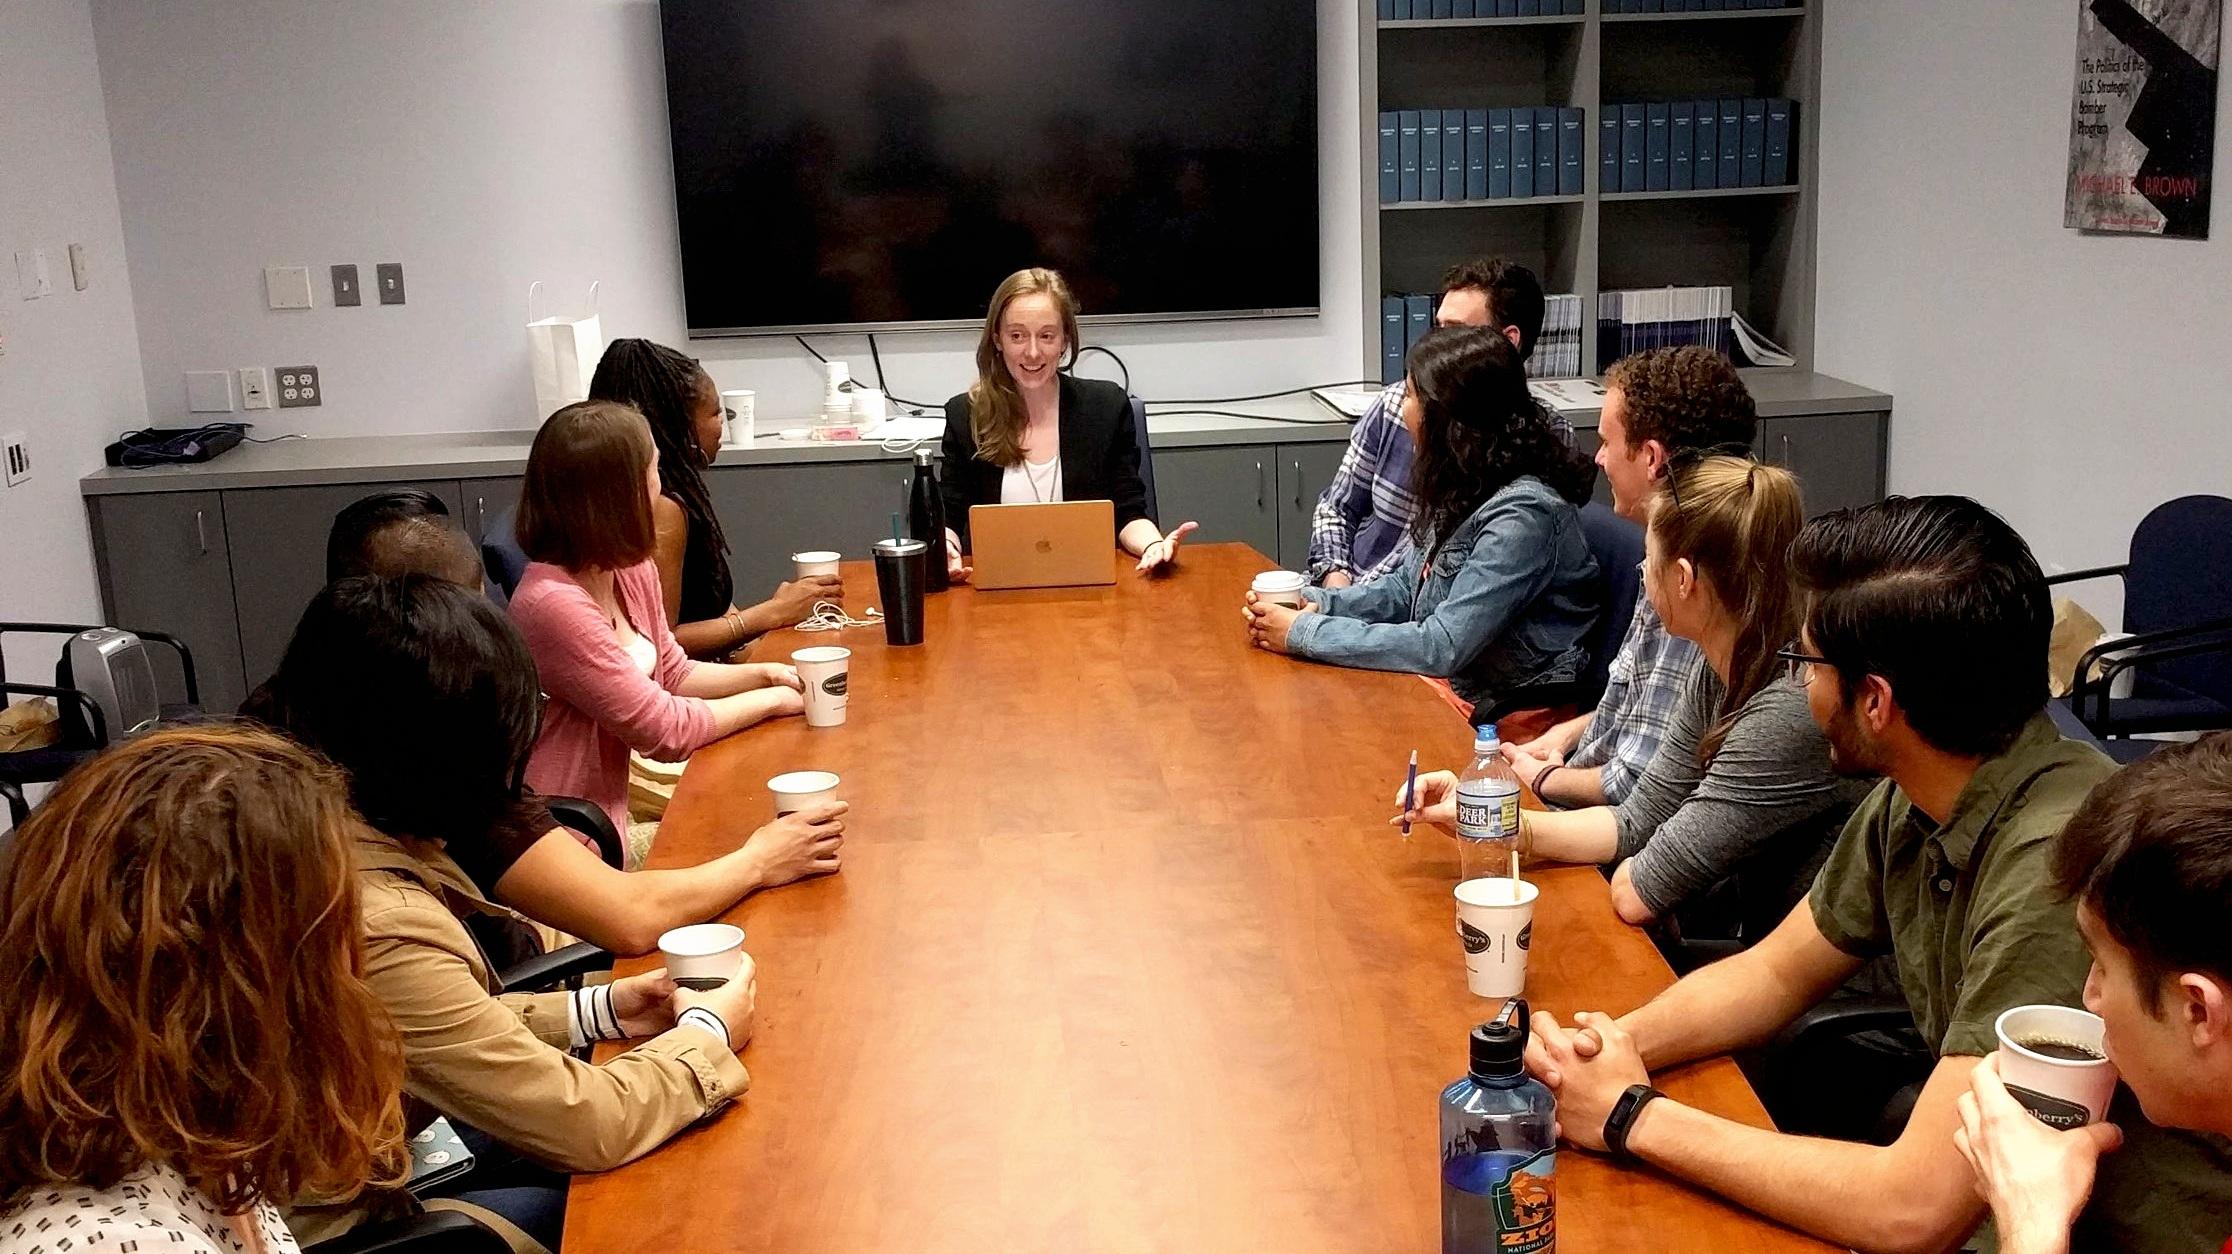 Teaching IAFF 3193W: Undergraduate Scholars Course, Elliott School of International Affairs, GWU, Washington DC, April 2018